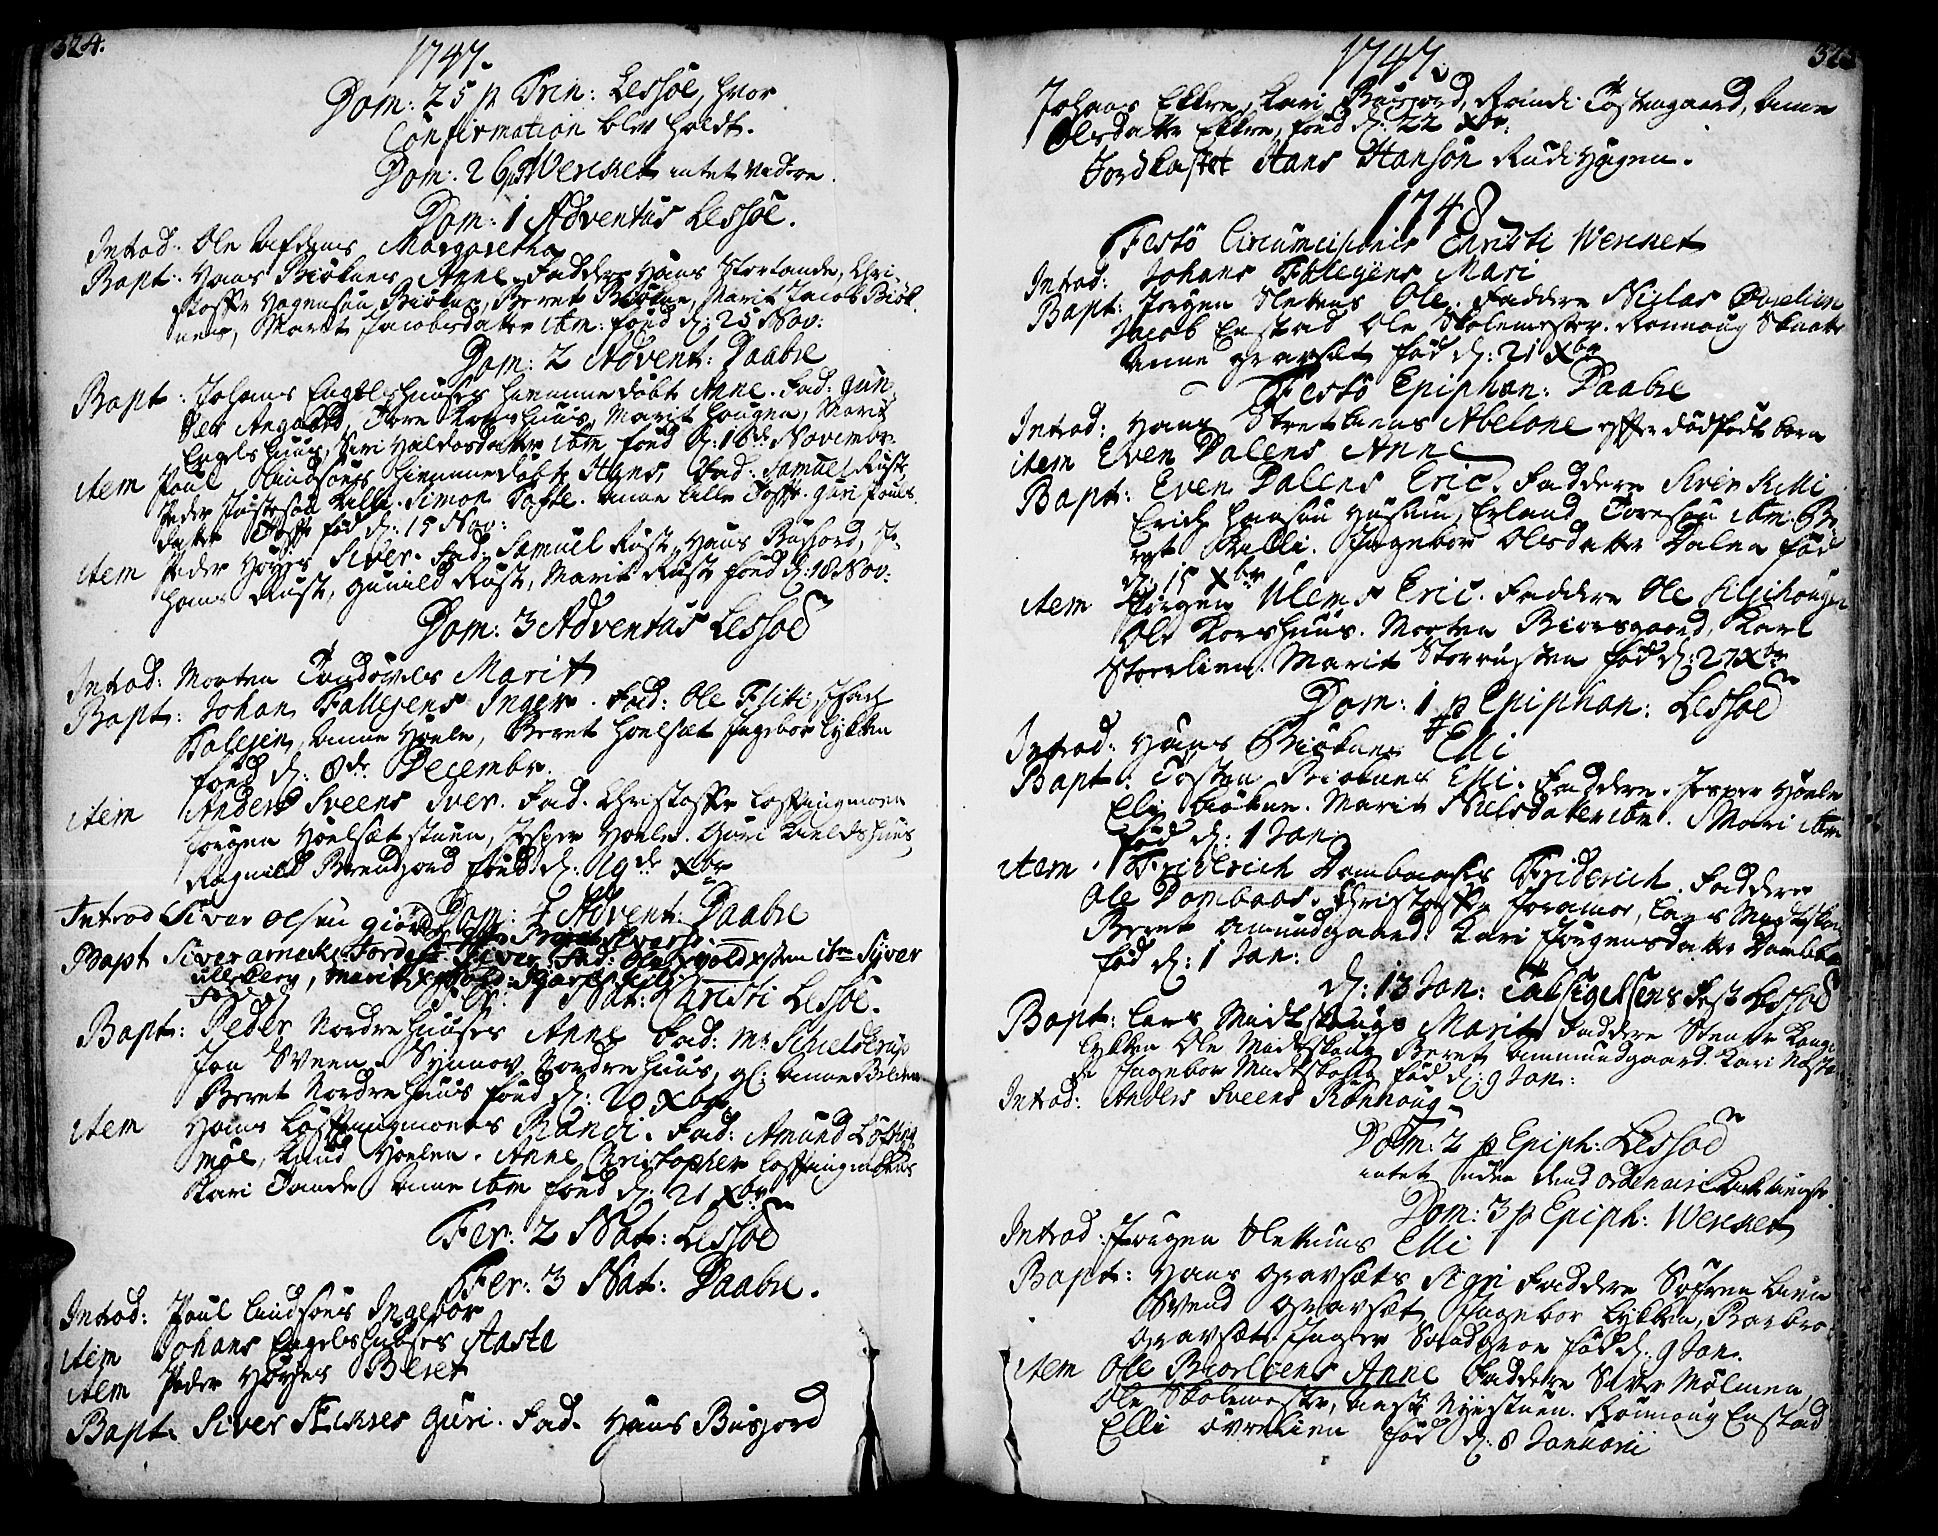 SAH, Lesja prestekontor, Ministerialbok nr. 2, 1732-1776, s. 324-325